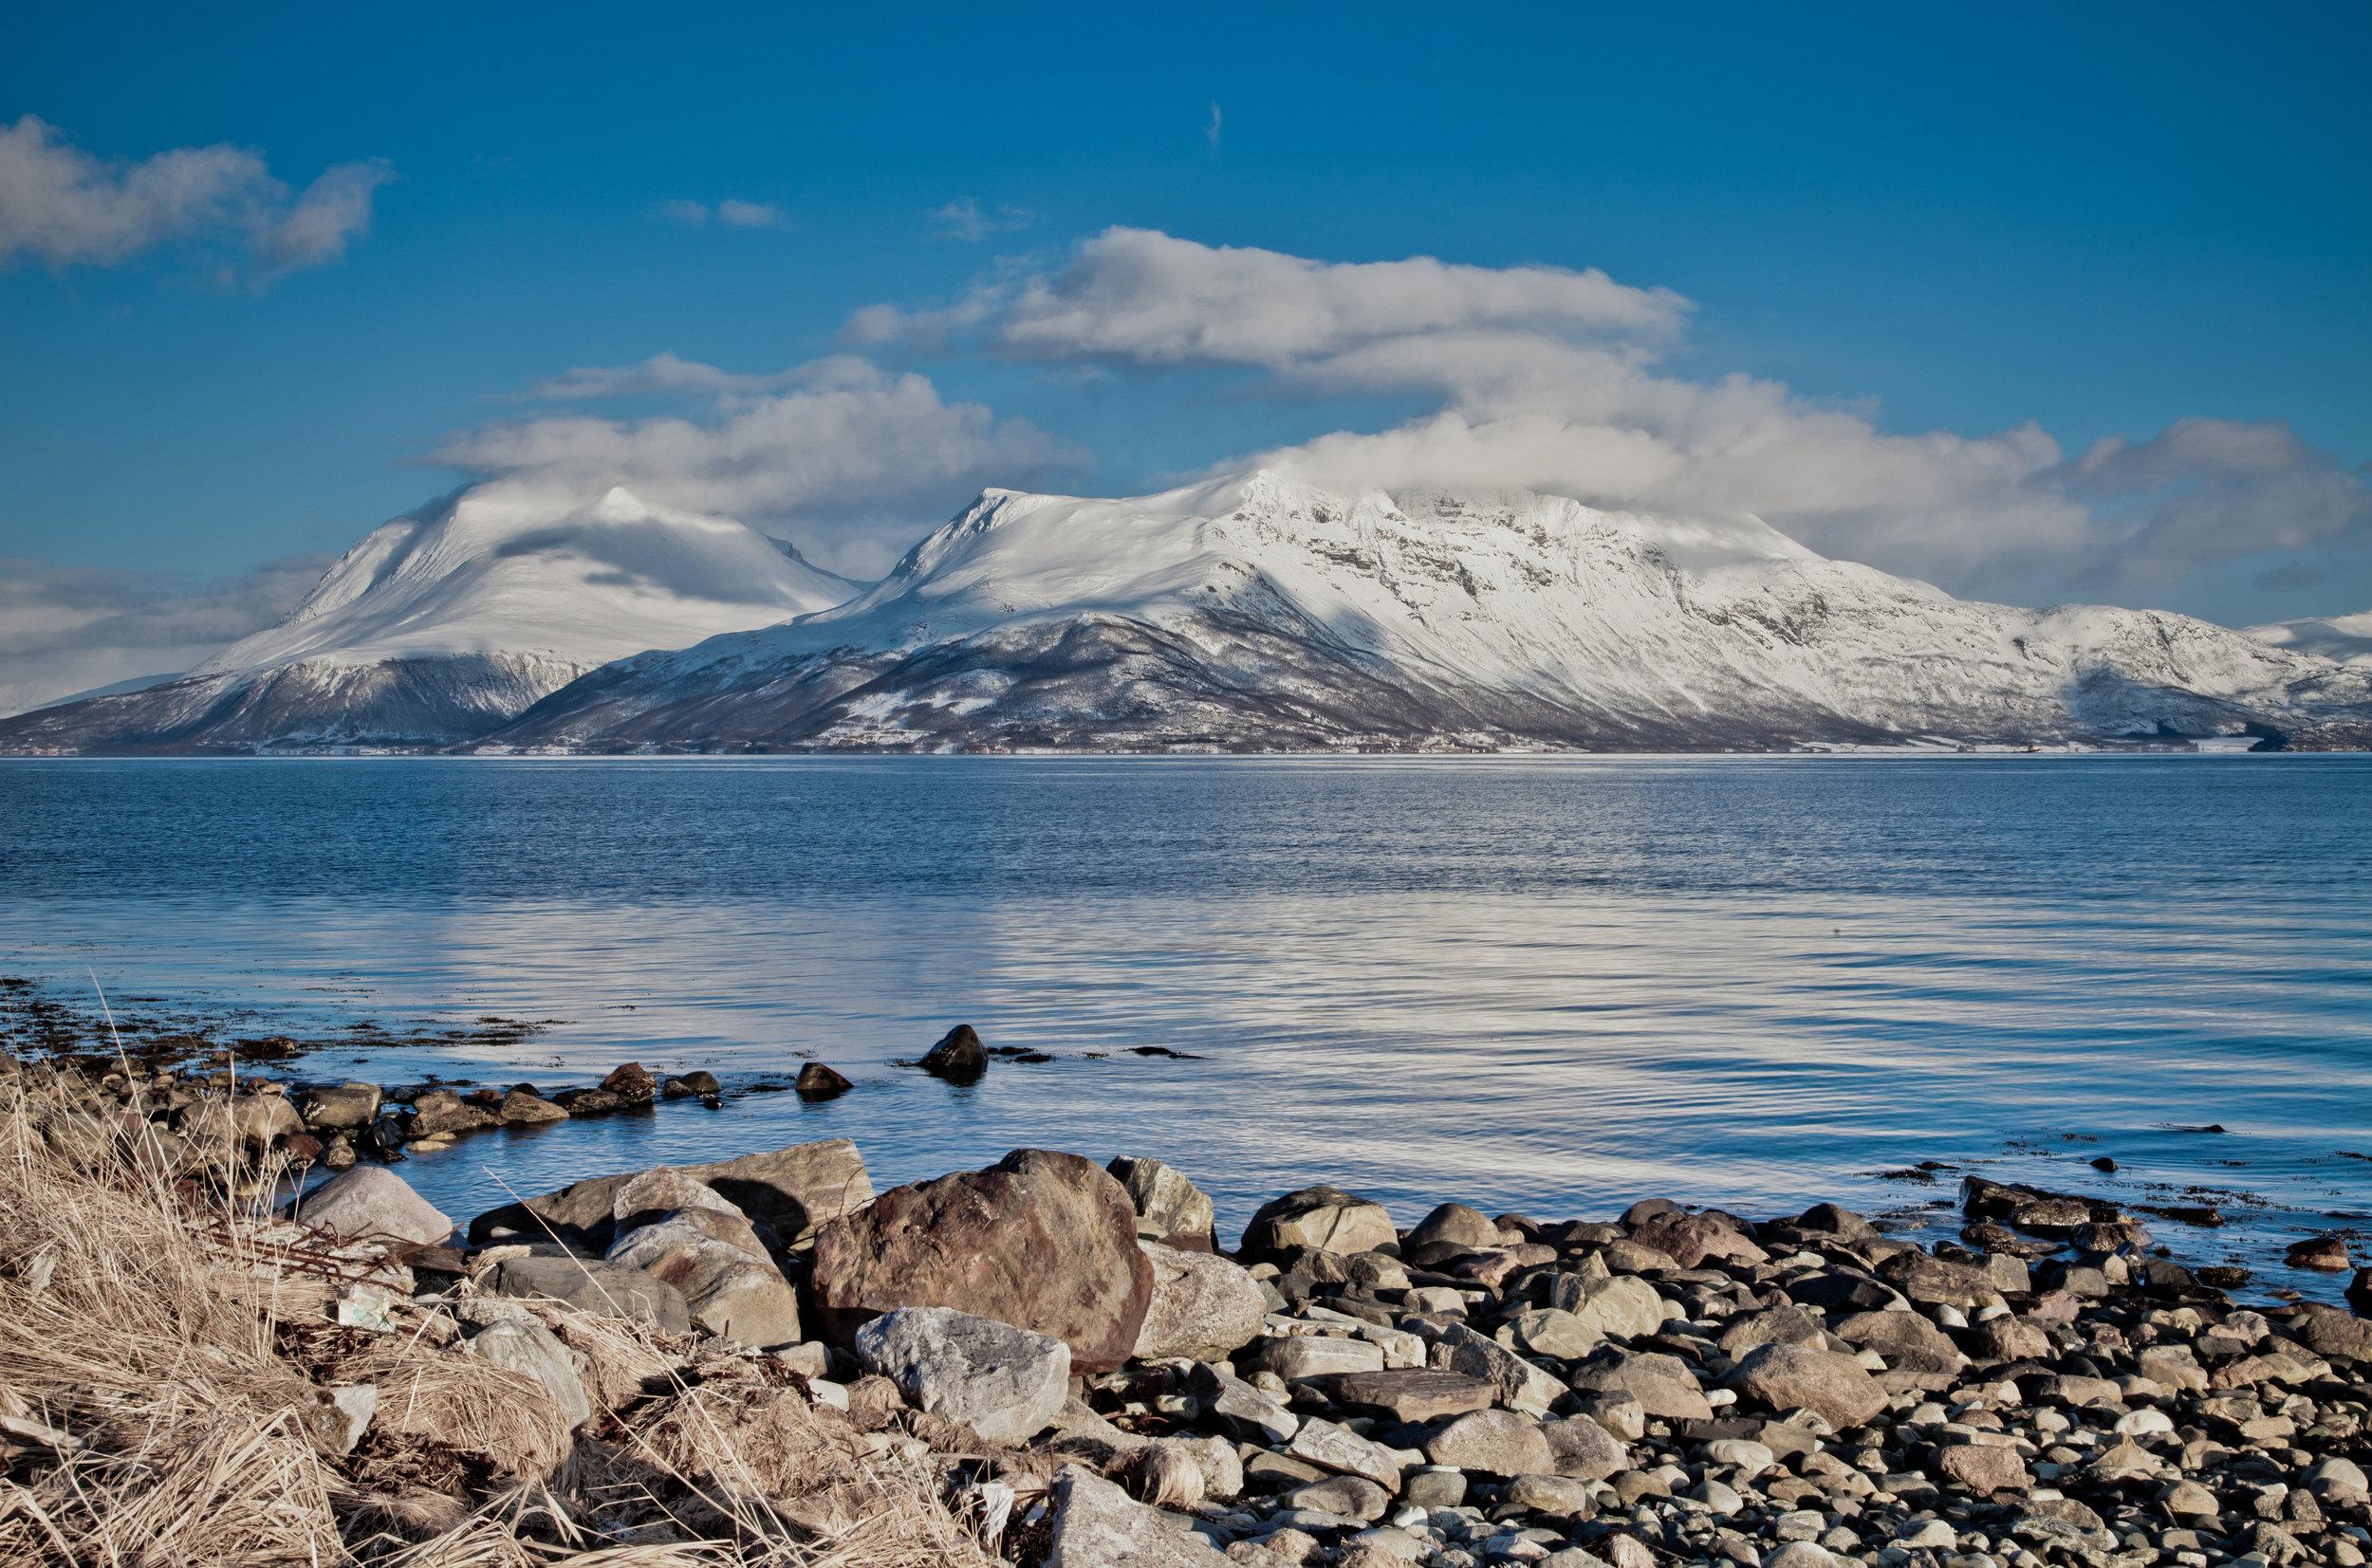 The-Isle-of-Kvaloya,-North-Norway_Mel-Manser.jpg